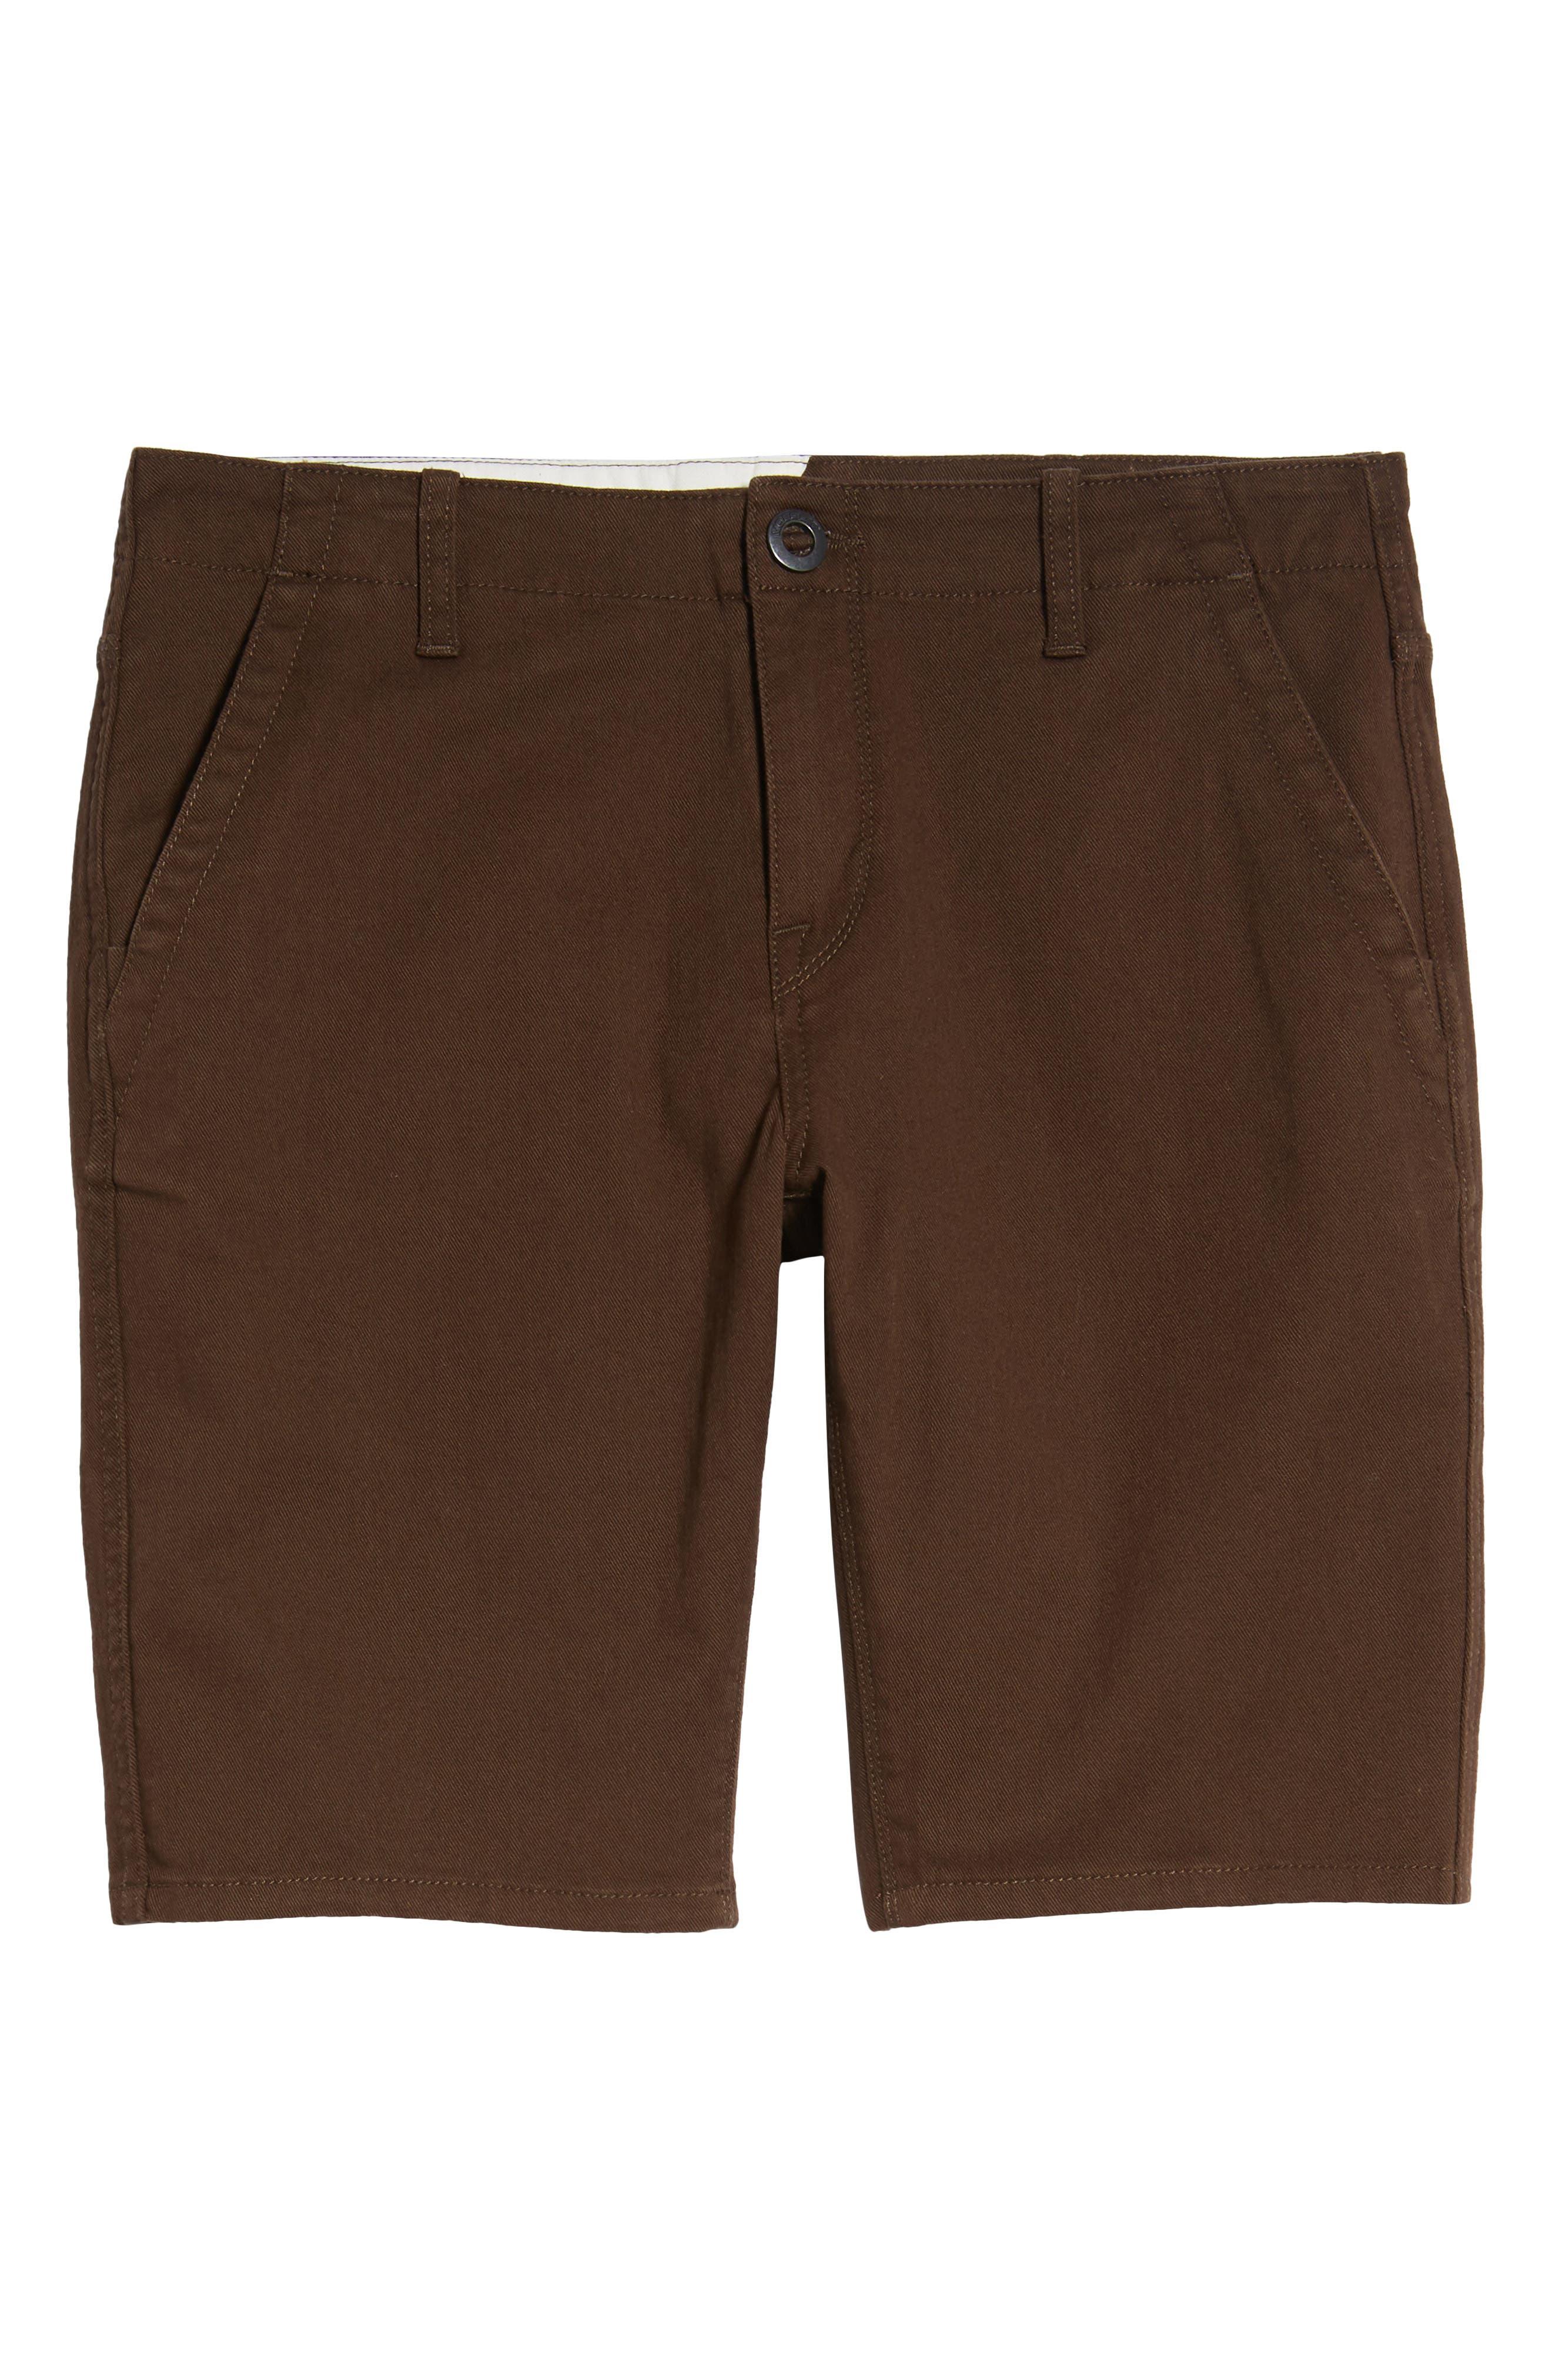 VSM Prowler Shorts,                             Alternate thumbnail 17, color,